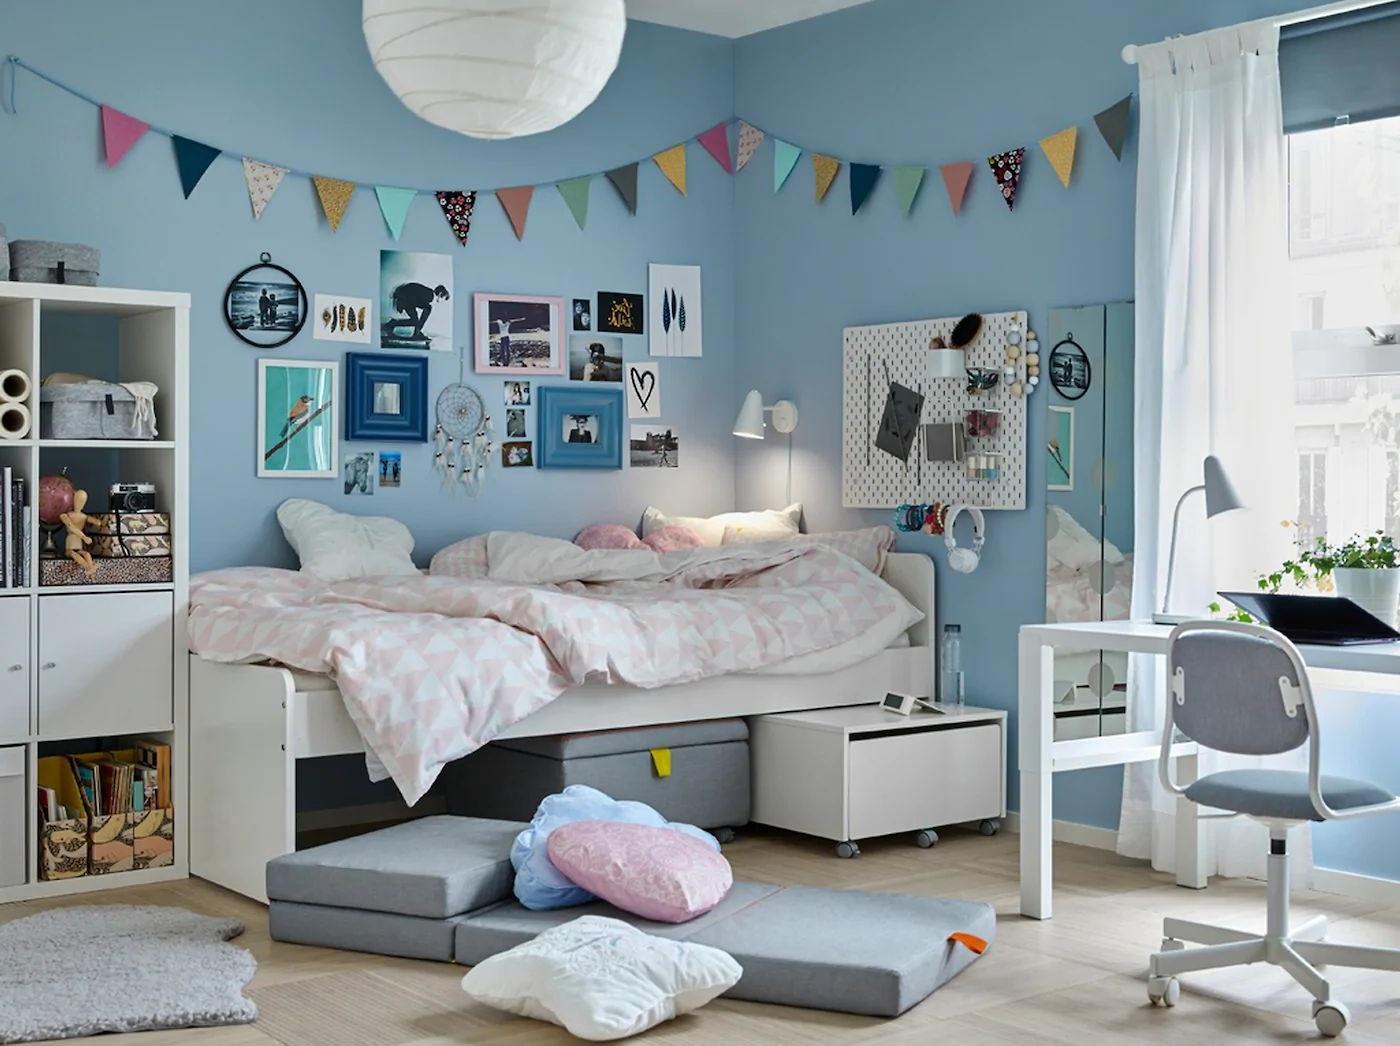 Chambre Ado Fille Ikea 12 Modeles Pour Vous Inspirer